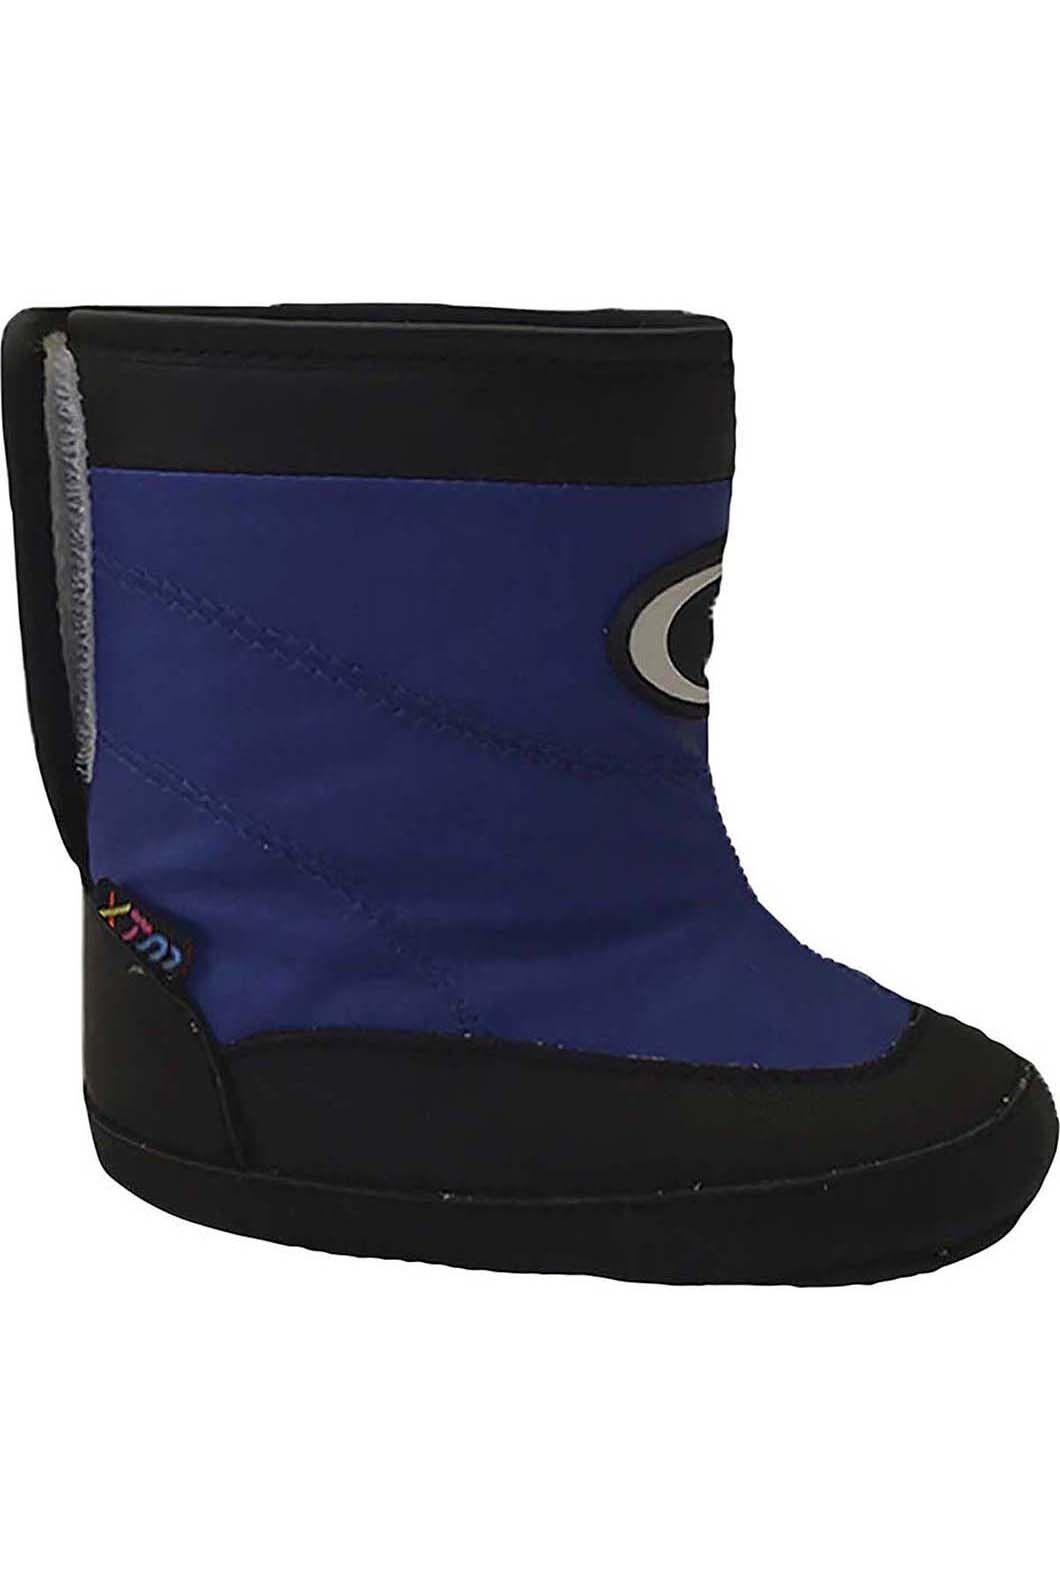 XTM Kids' Infant Puddles II Snow Boots, Blue, hi-res